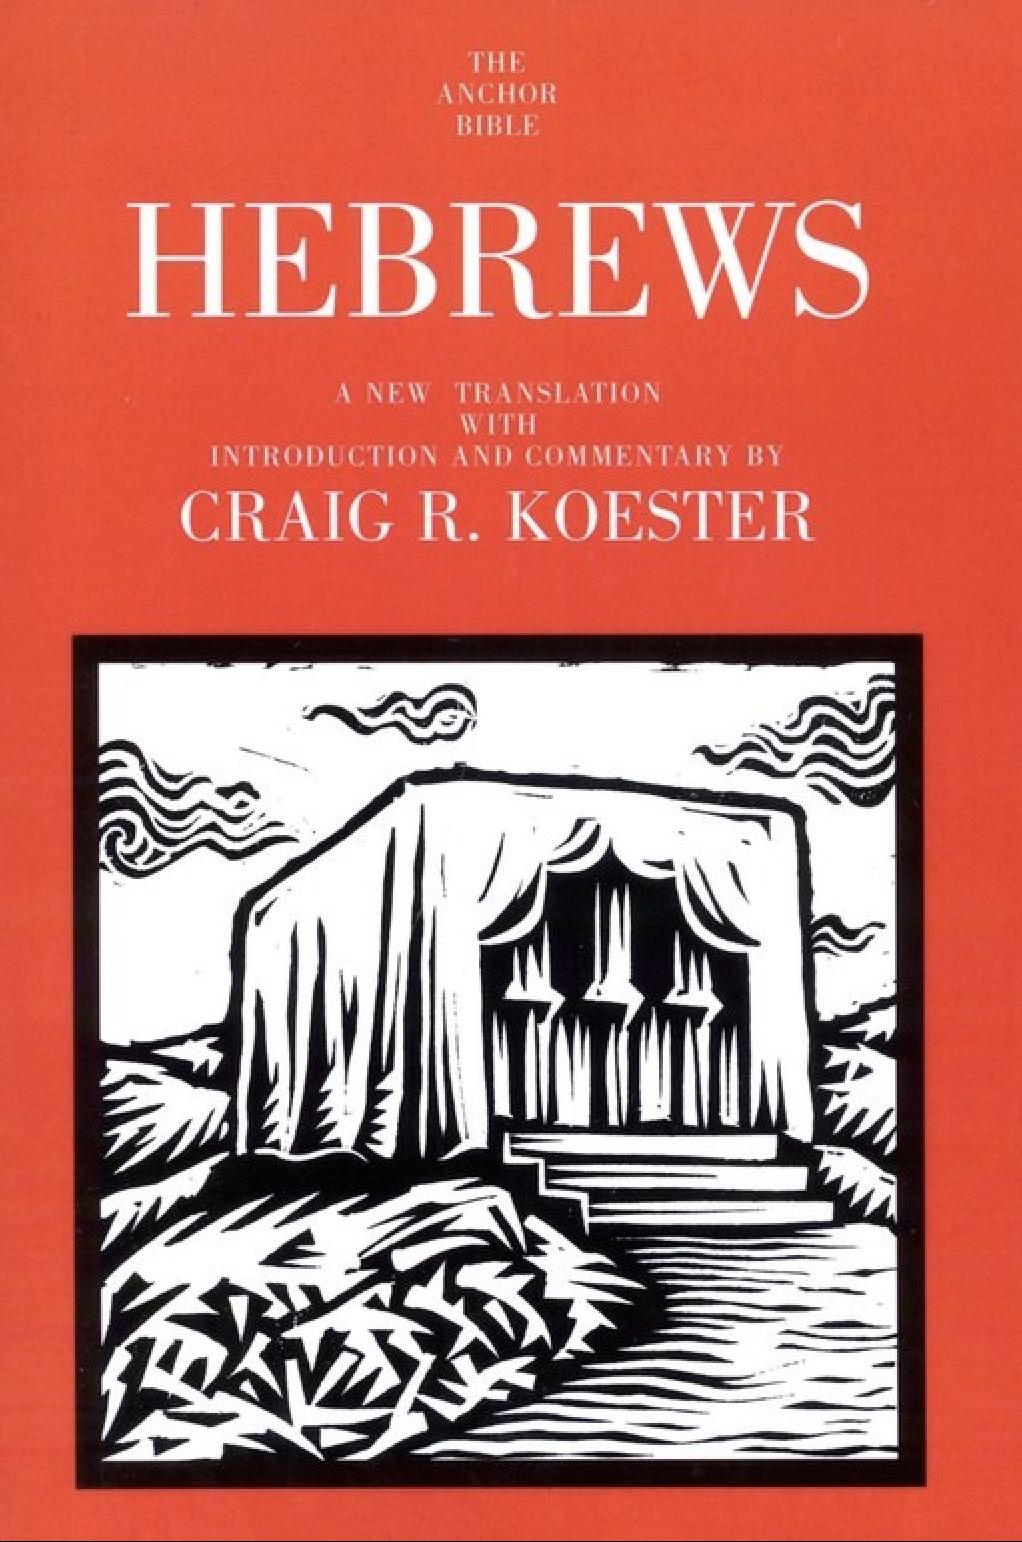 Craig Koester, AYBC: Hebrews